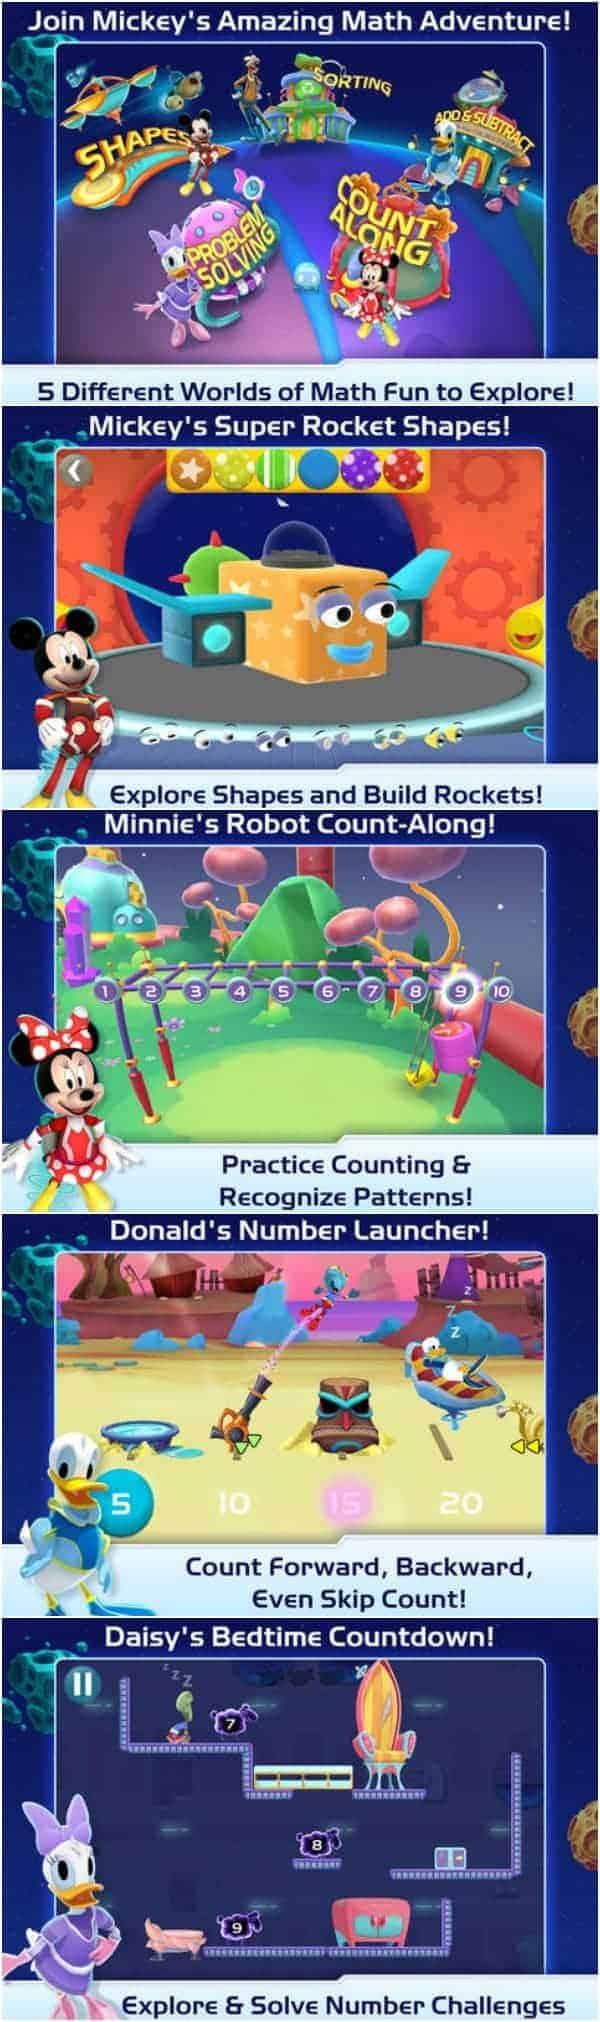 Mickeys-Magical-Math-World-Imagicademy